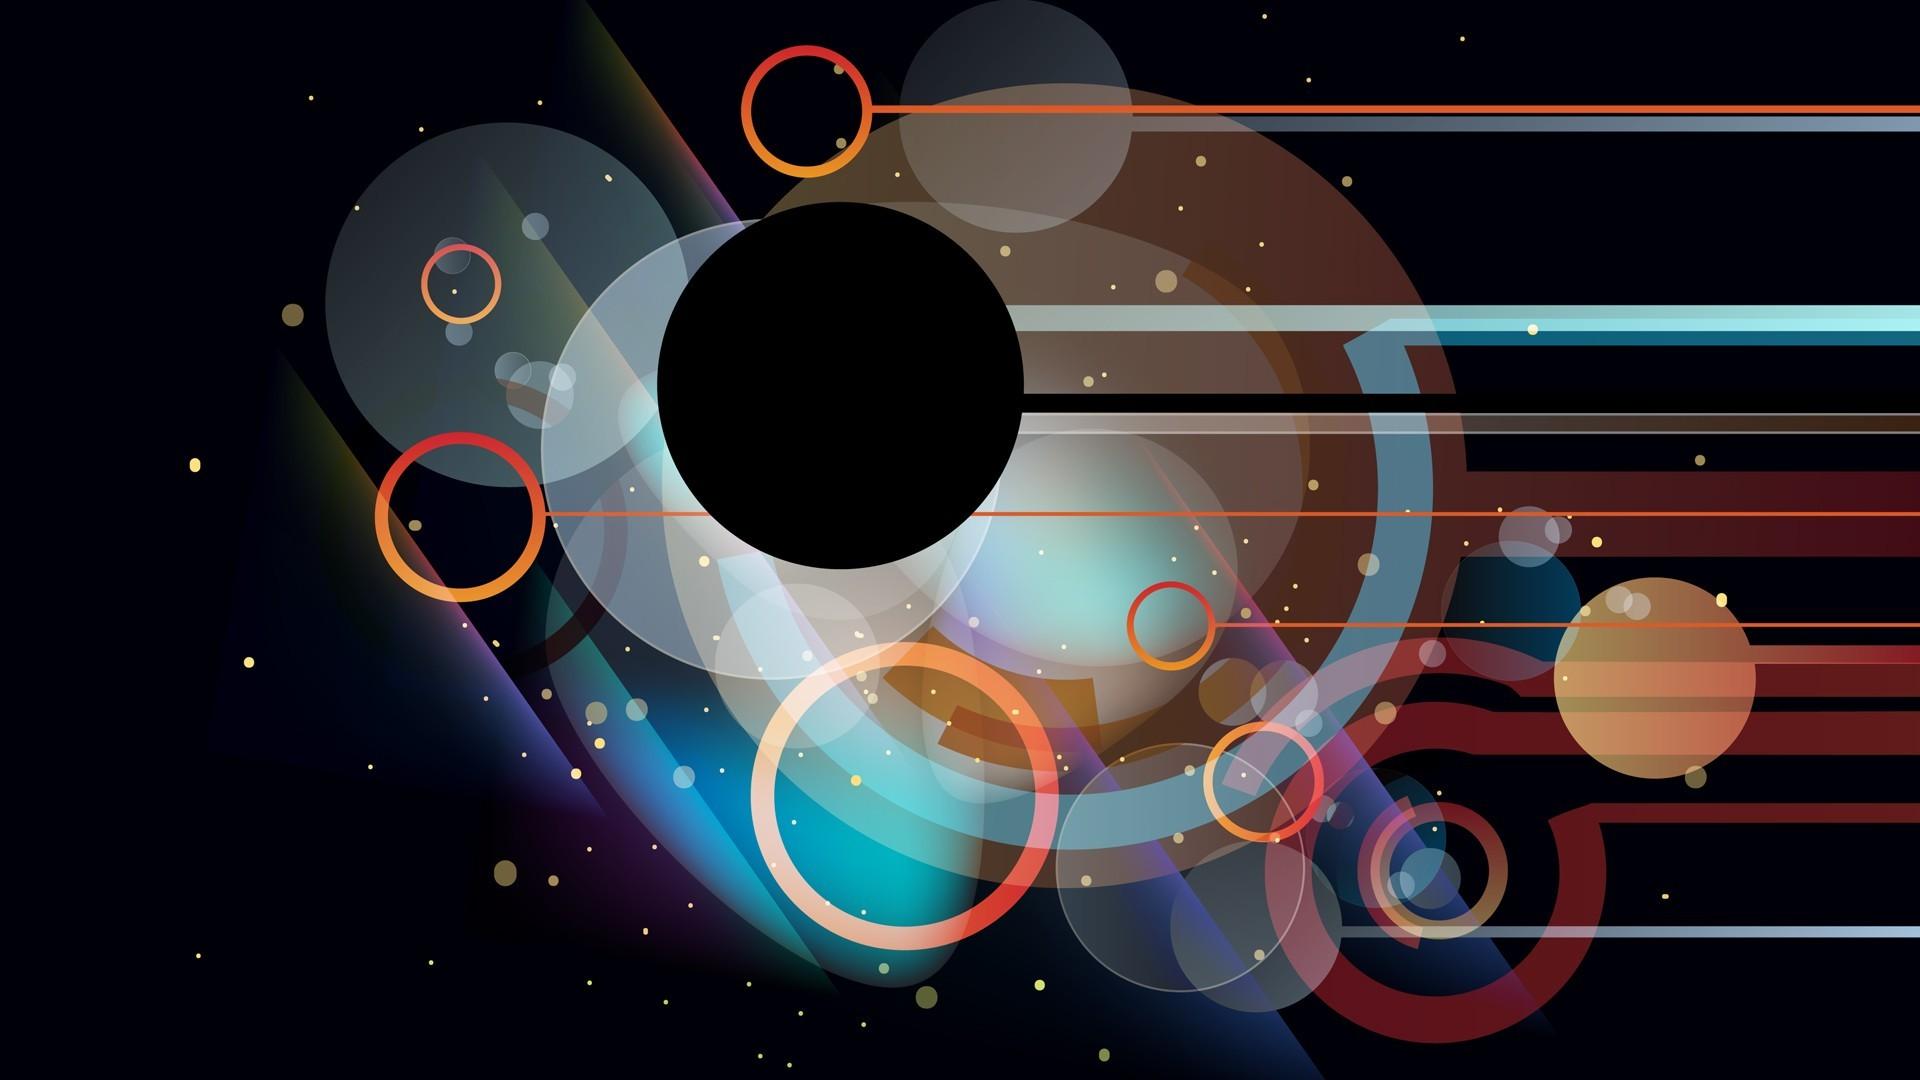 wallpaper illustration planet vehicle circle lines shapes